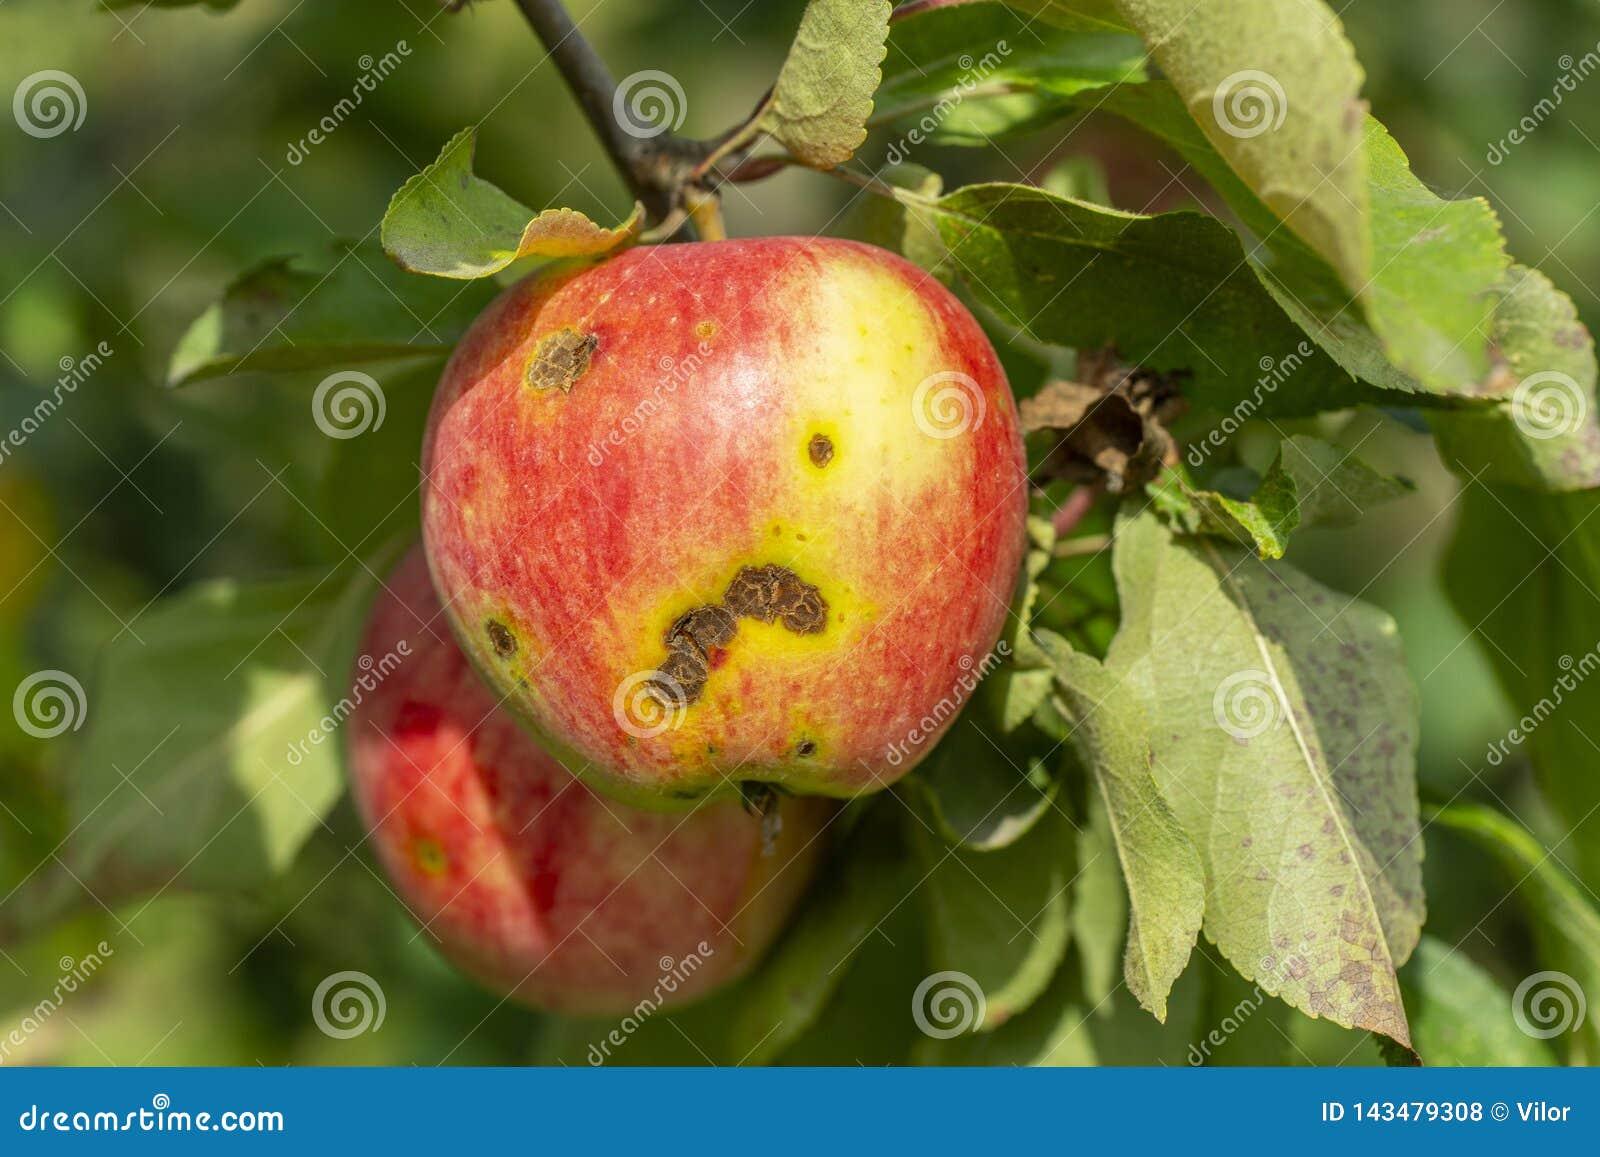 Apple scab disease stock photo  Image of tree, disease